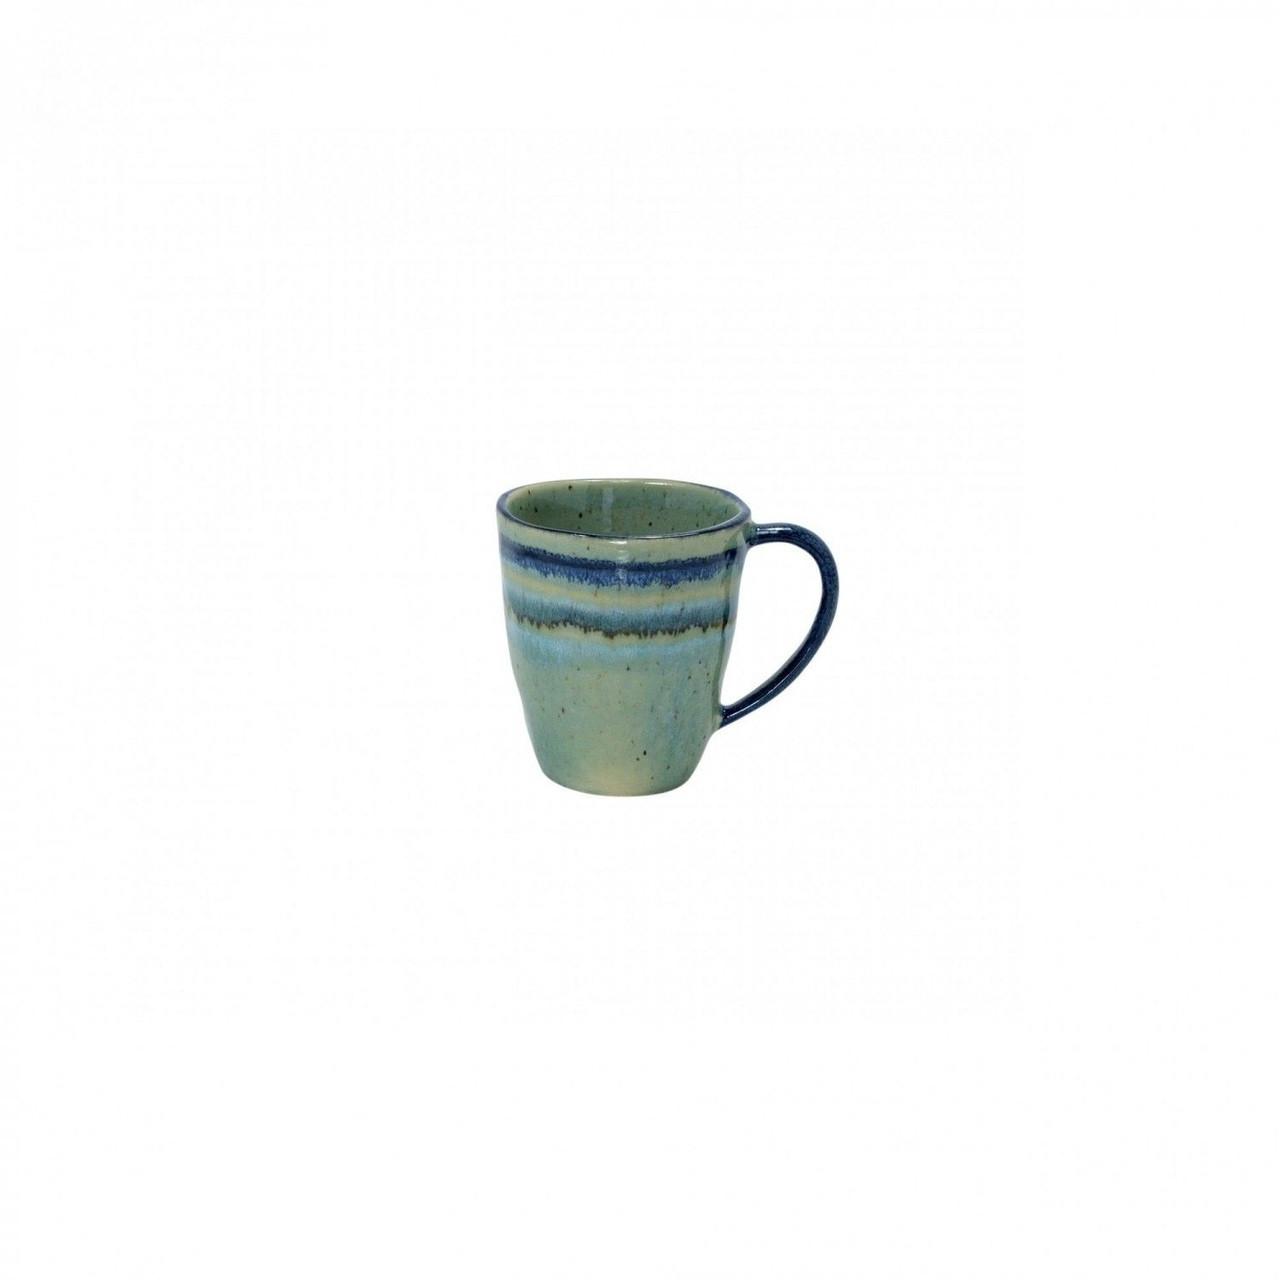 Casa Stone By Casafina casafina sausalito straight coffee mug green 14.5 oz sa3309-grn